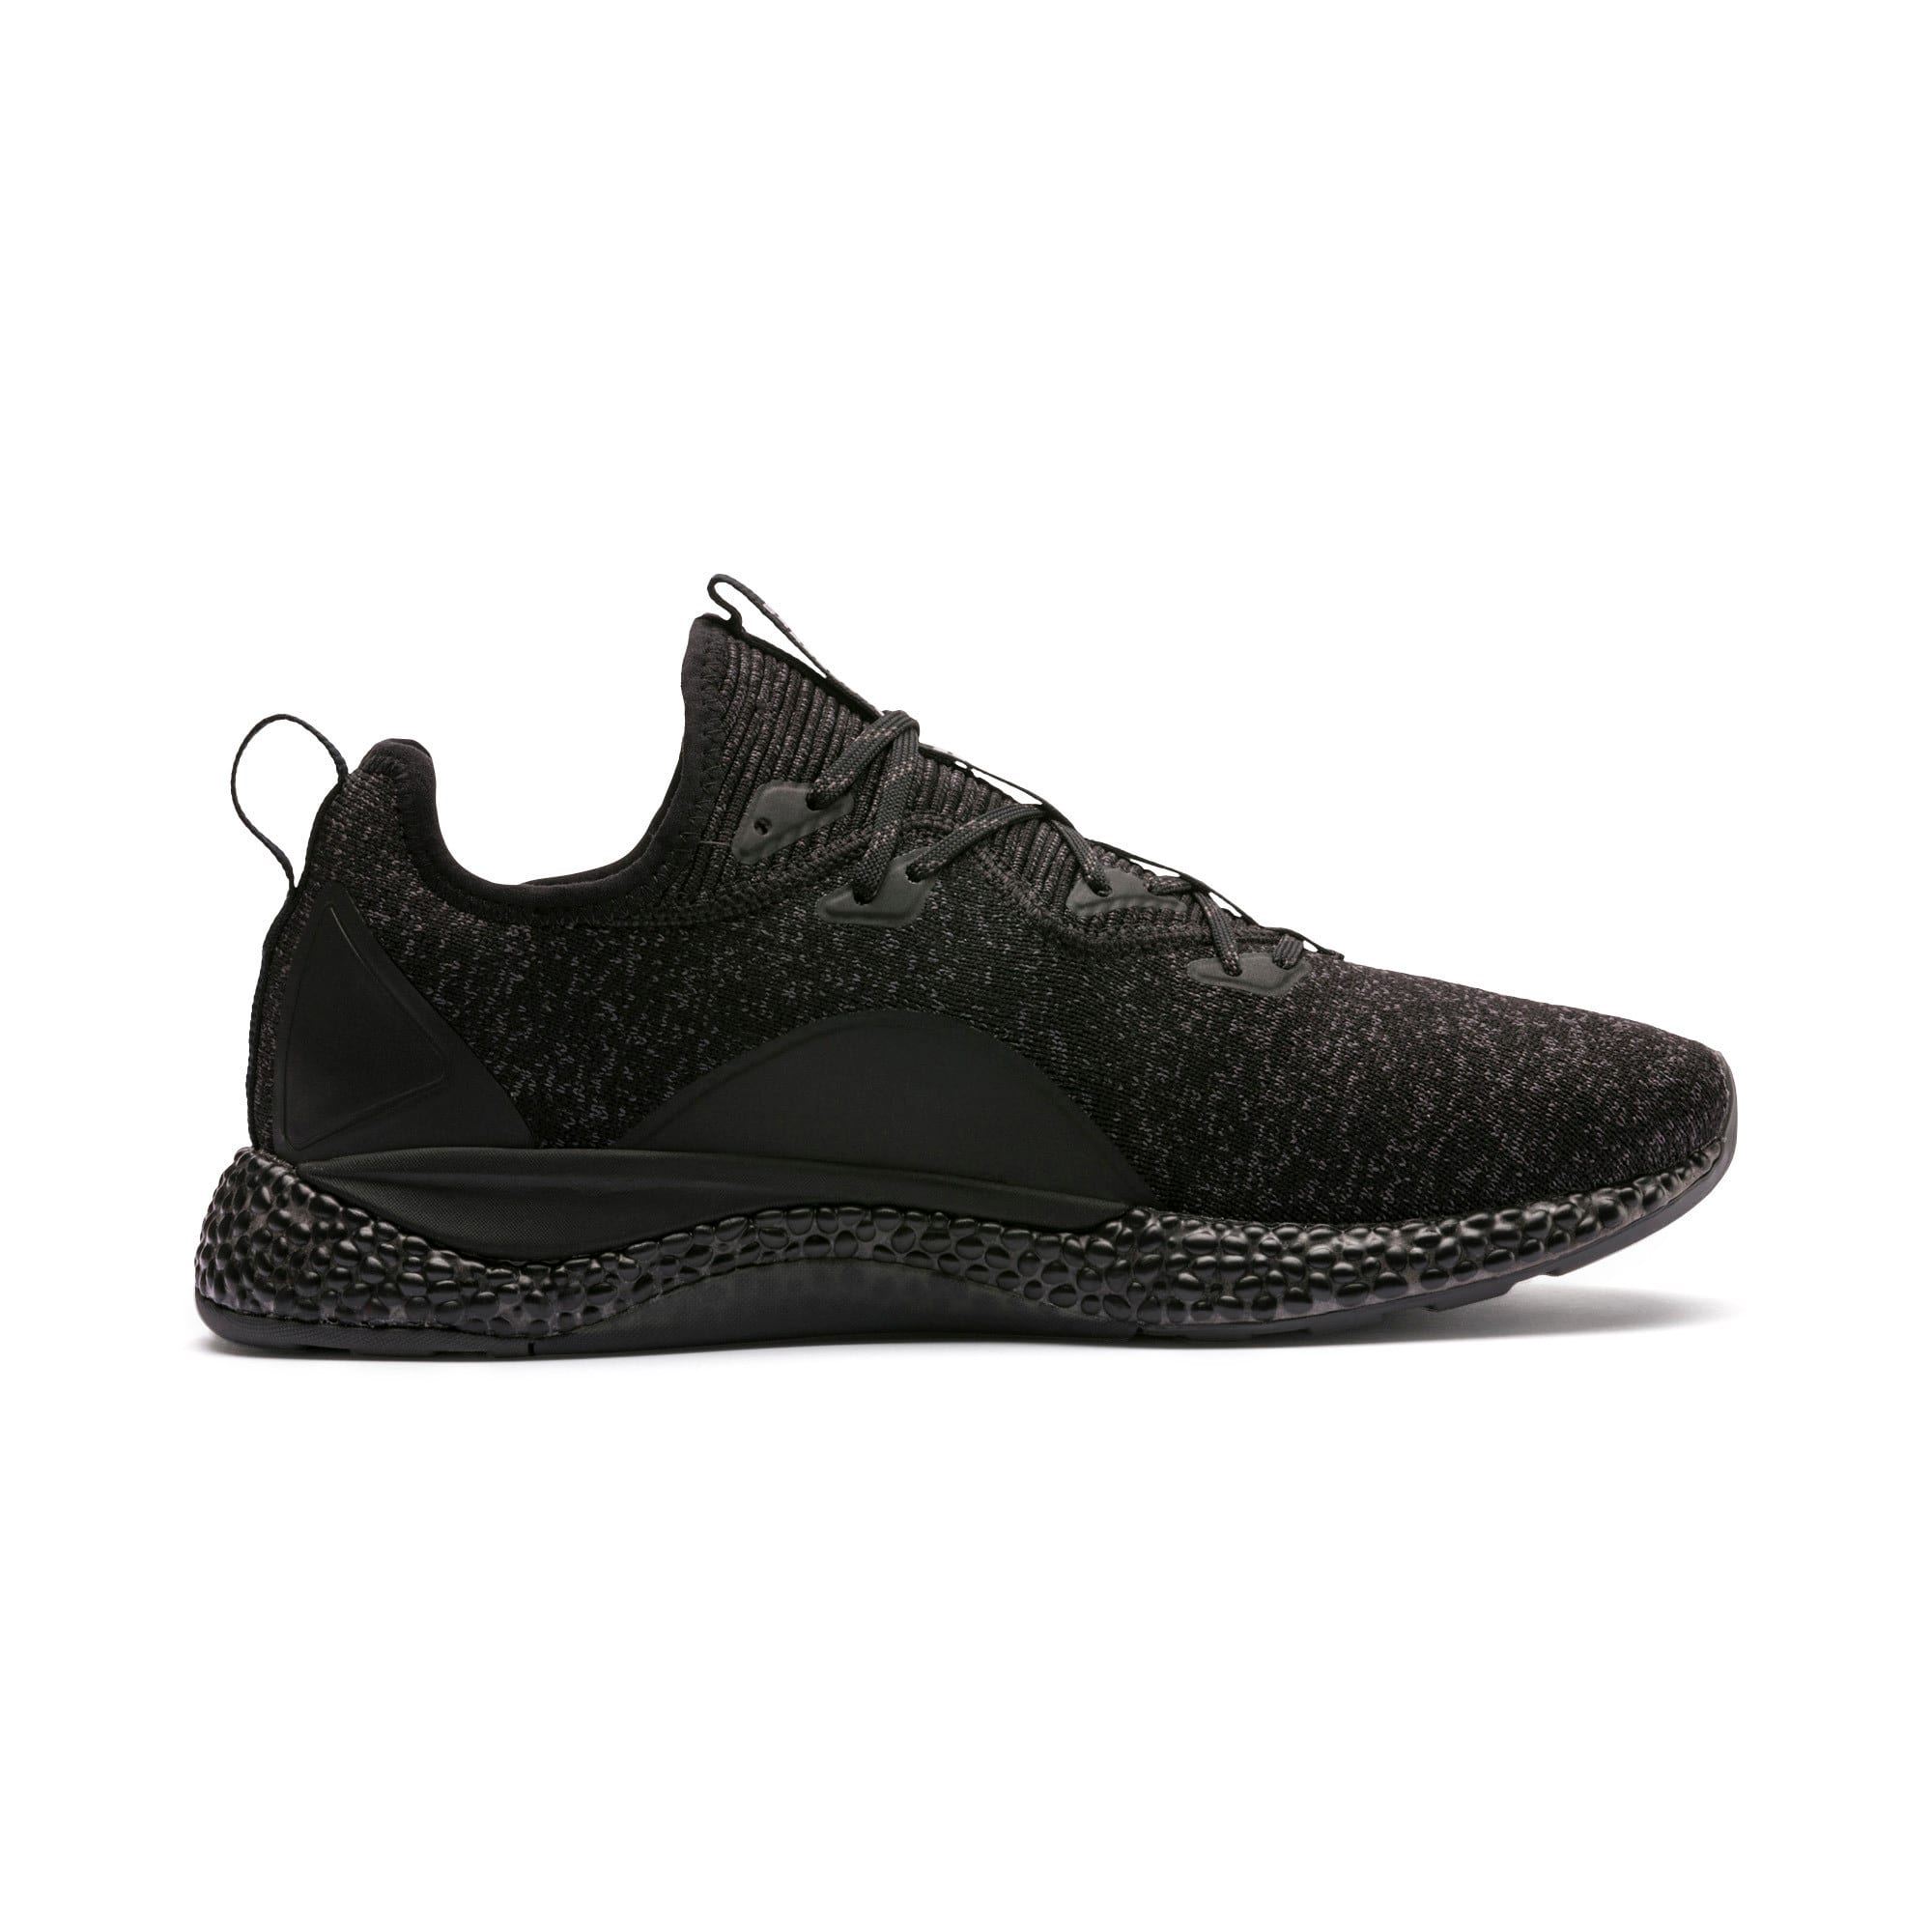 Thumbnail 6 of Hybrid Runner Men's Running Shoes, Asphalt-Puma Black, medium